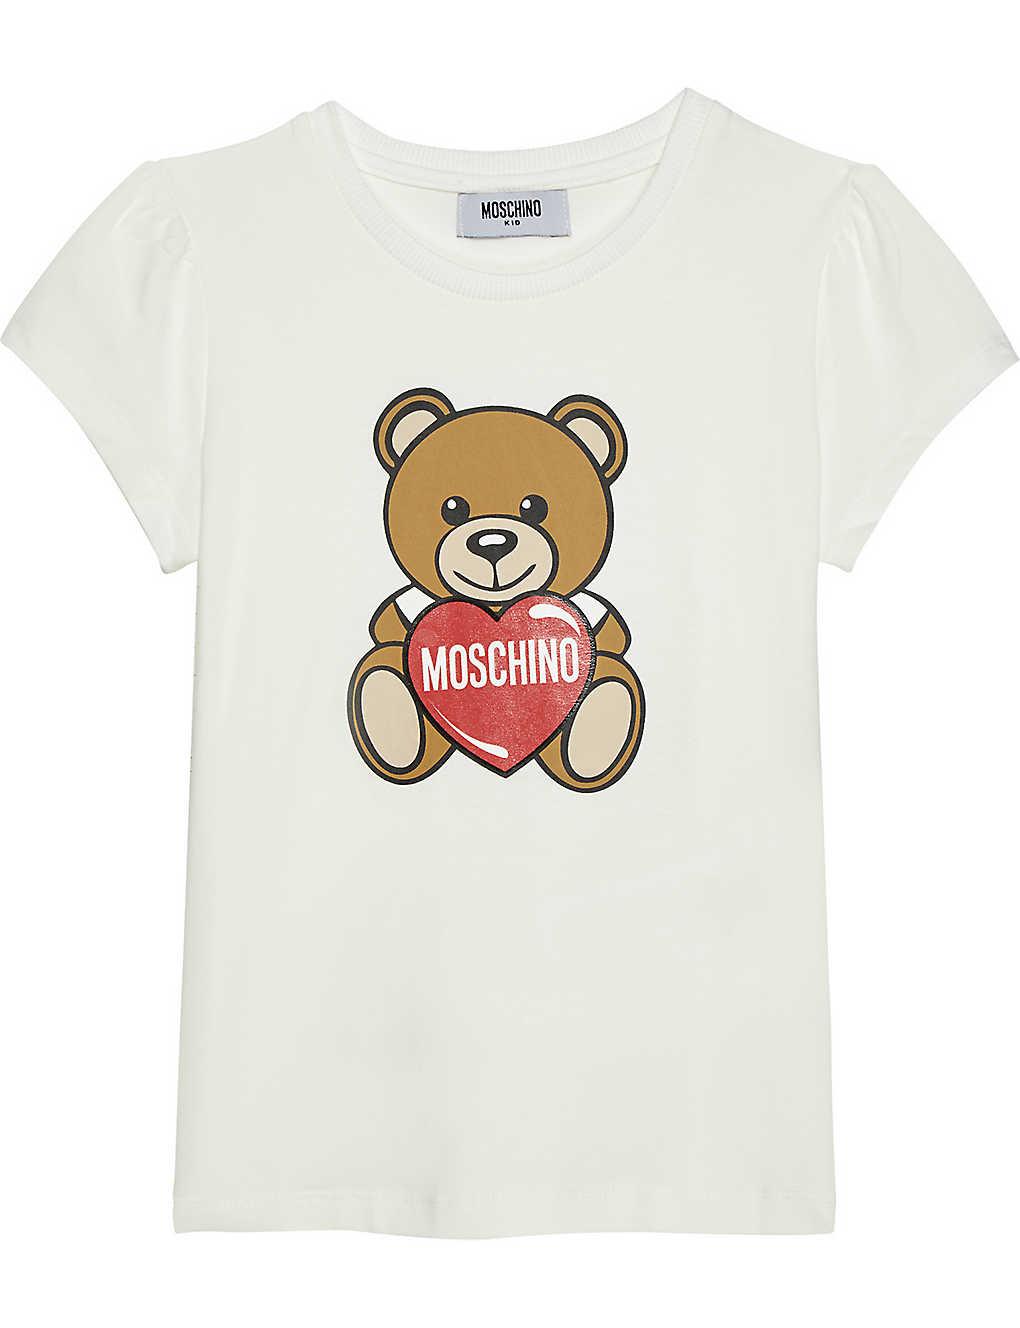 7f8ed5037f3 MOSCHINO - Toy Bear cotton T-shirt 4-14 years | Selfridges.com